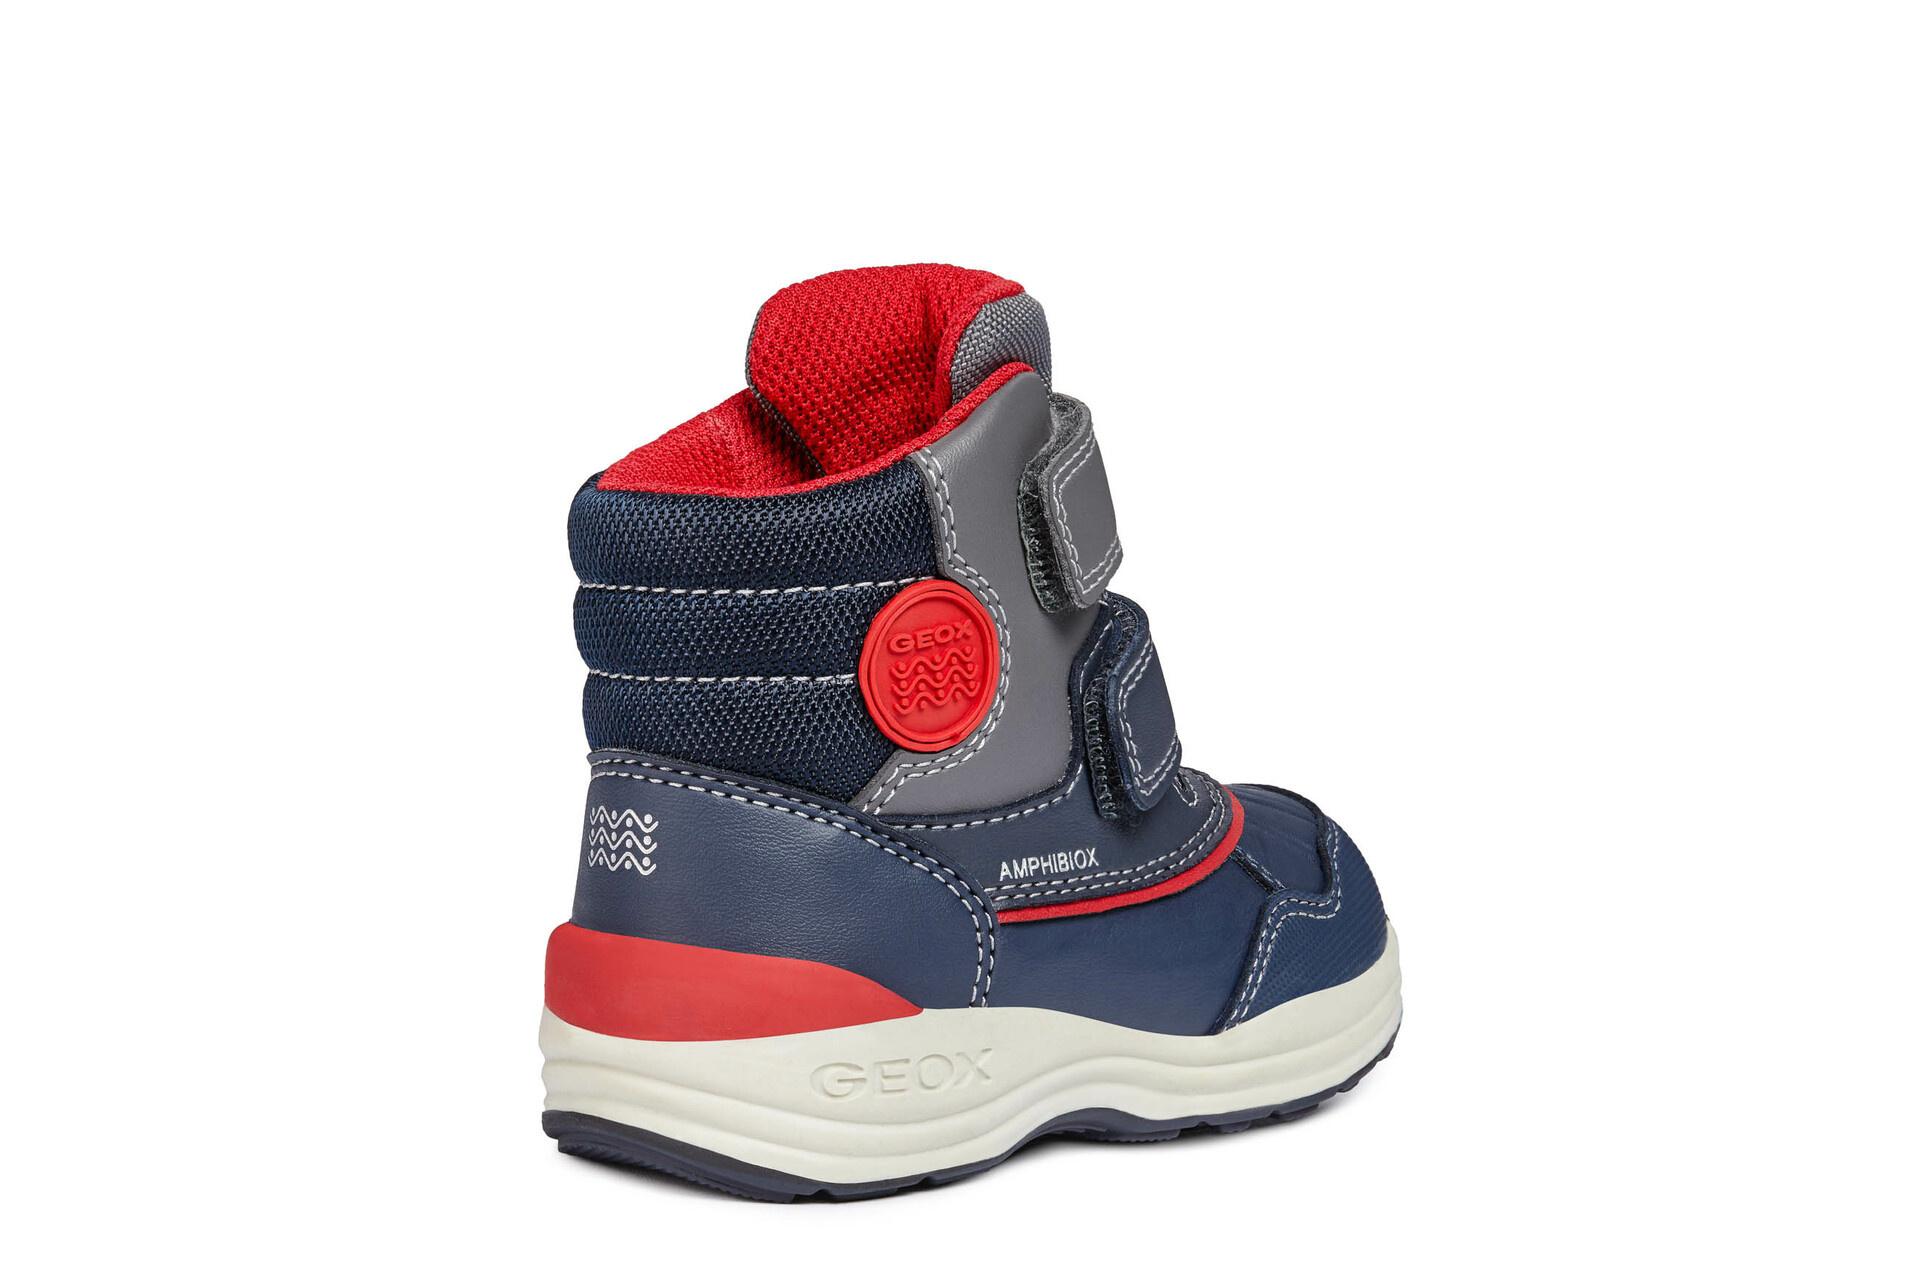 Geox Gulp Navy Red Infant